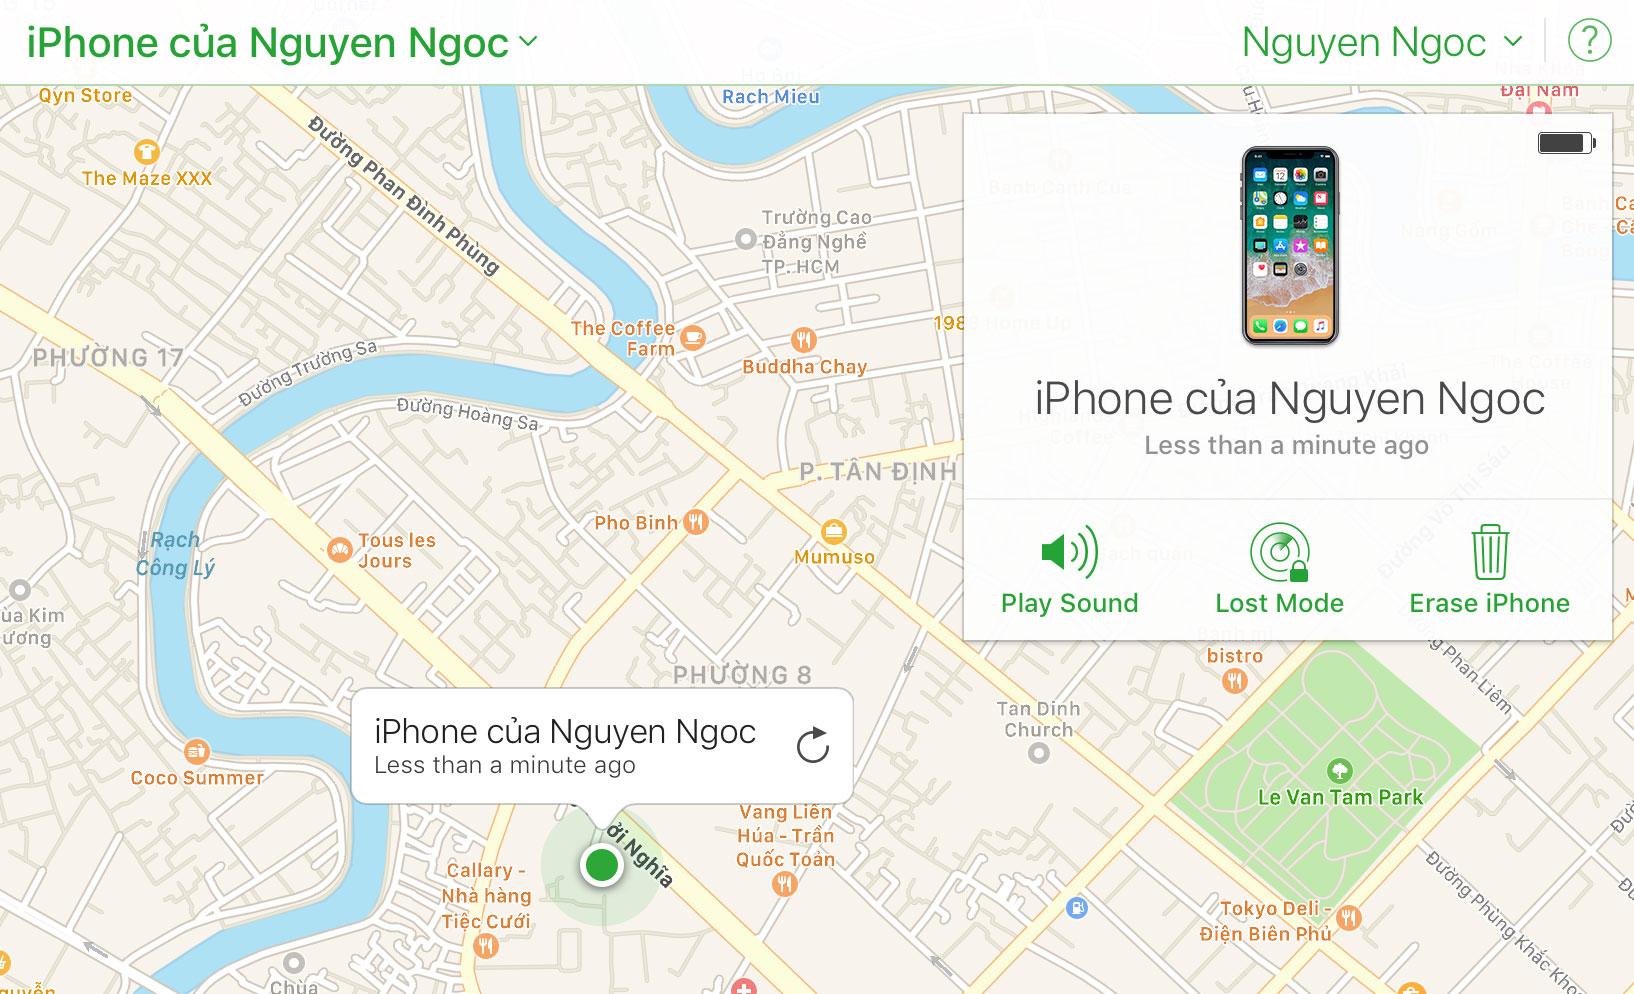 iphone_icloud_mat.jpg